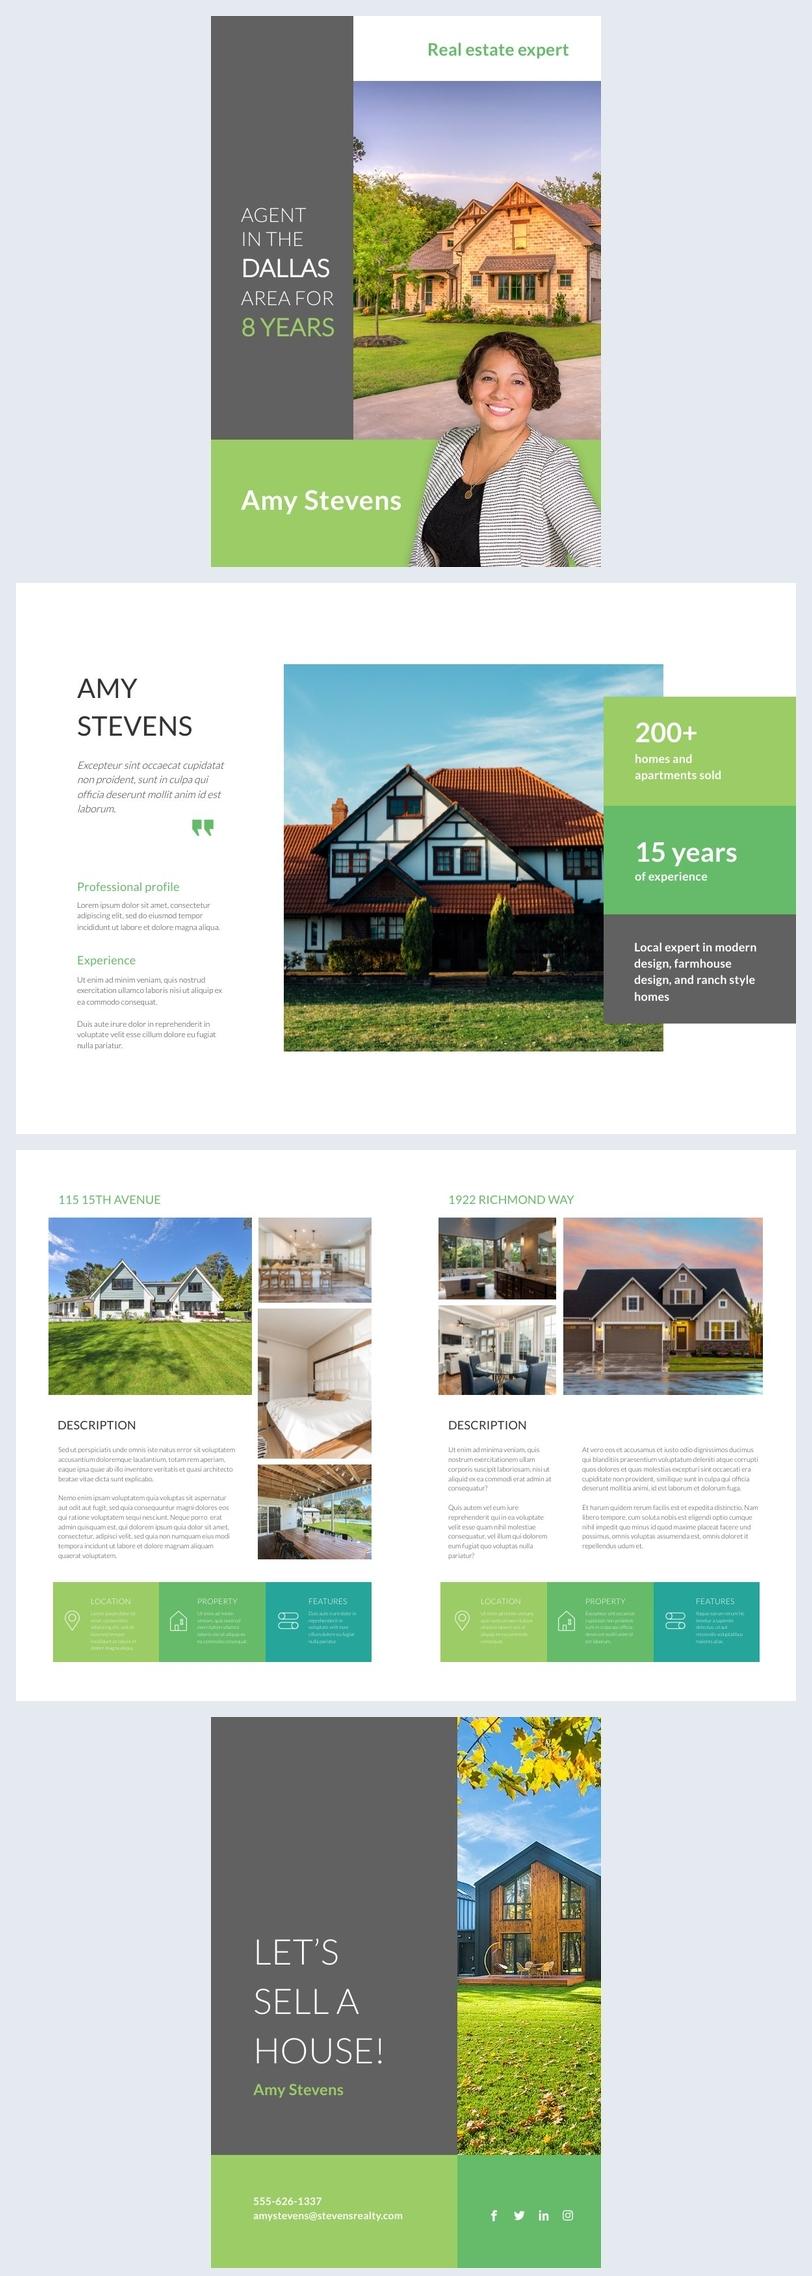 Real Estate Agent Brochure Design Example